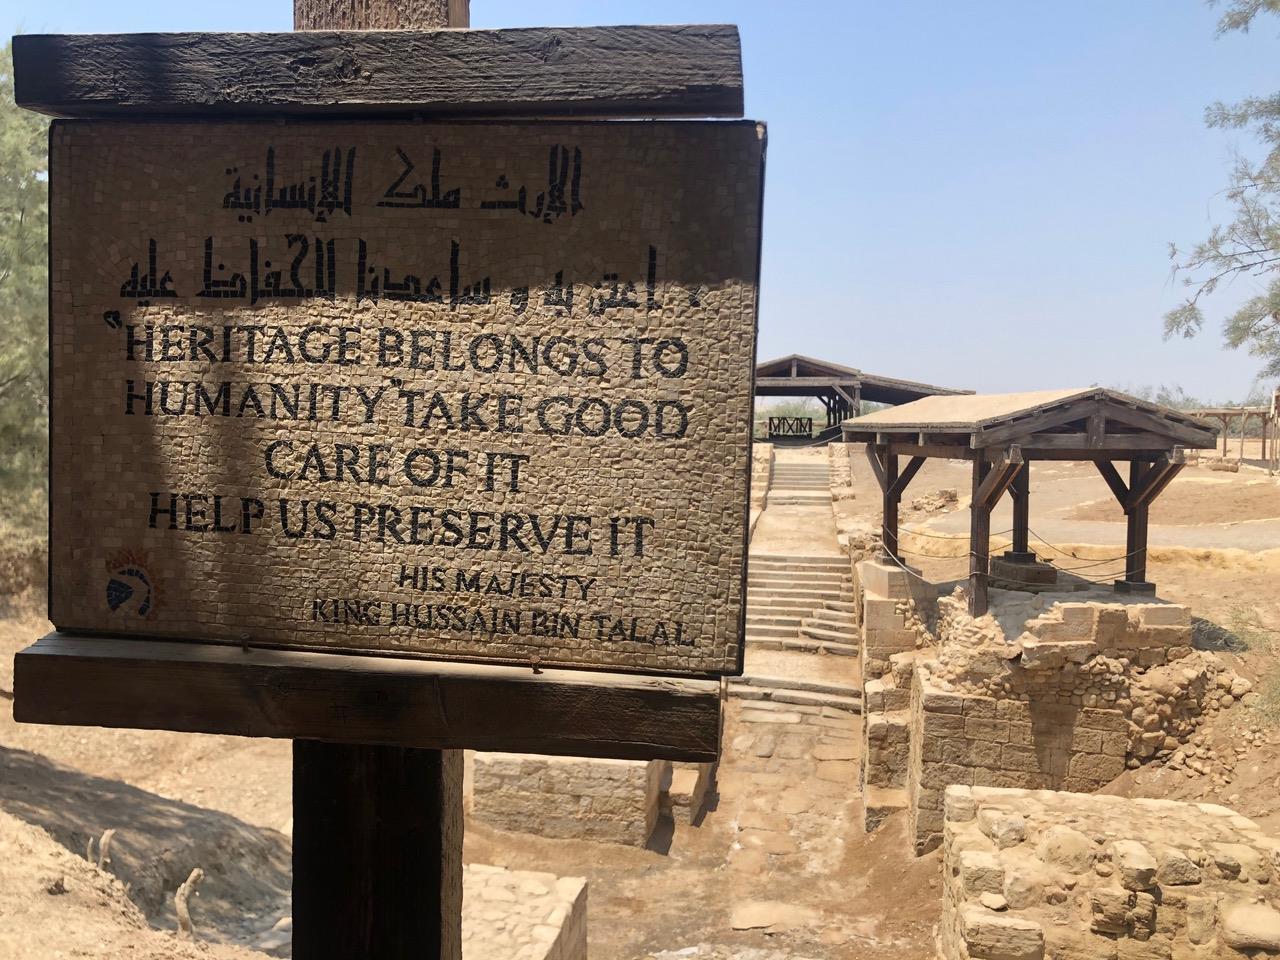 Imaxe de: La tierra prometida 2: Jordania y Palestina